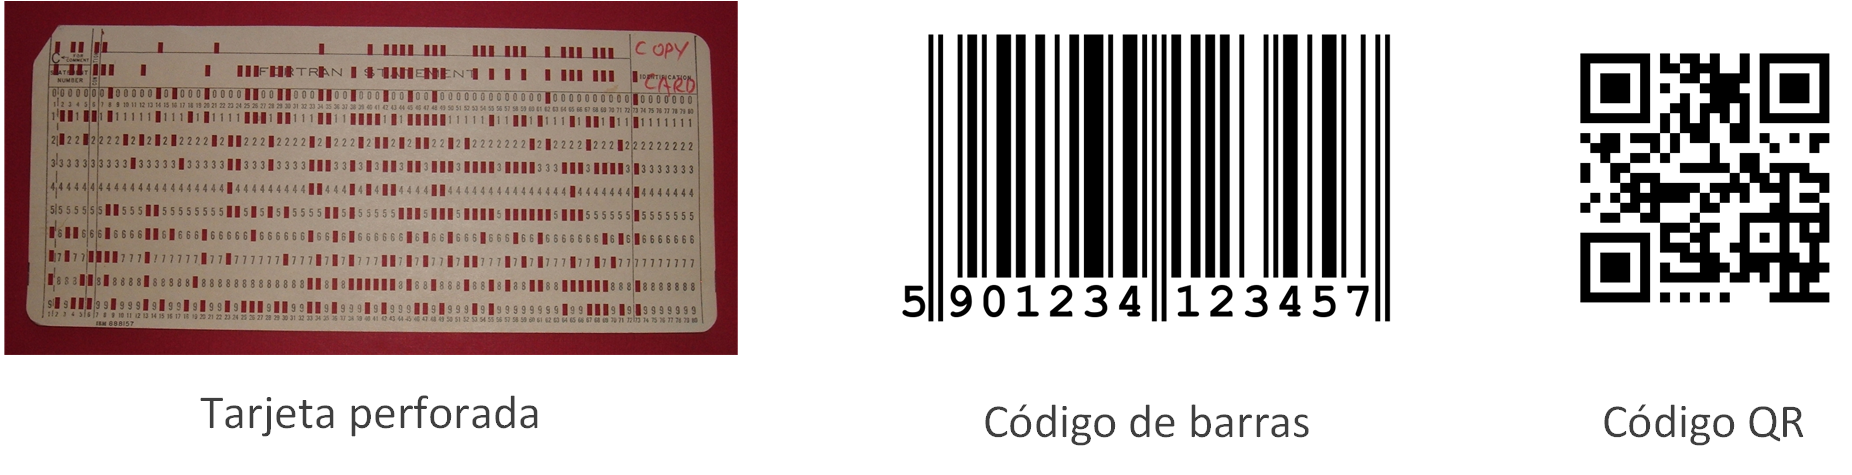 Imagne de tarjeta perforada, código de barras y código QR